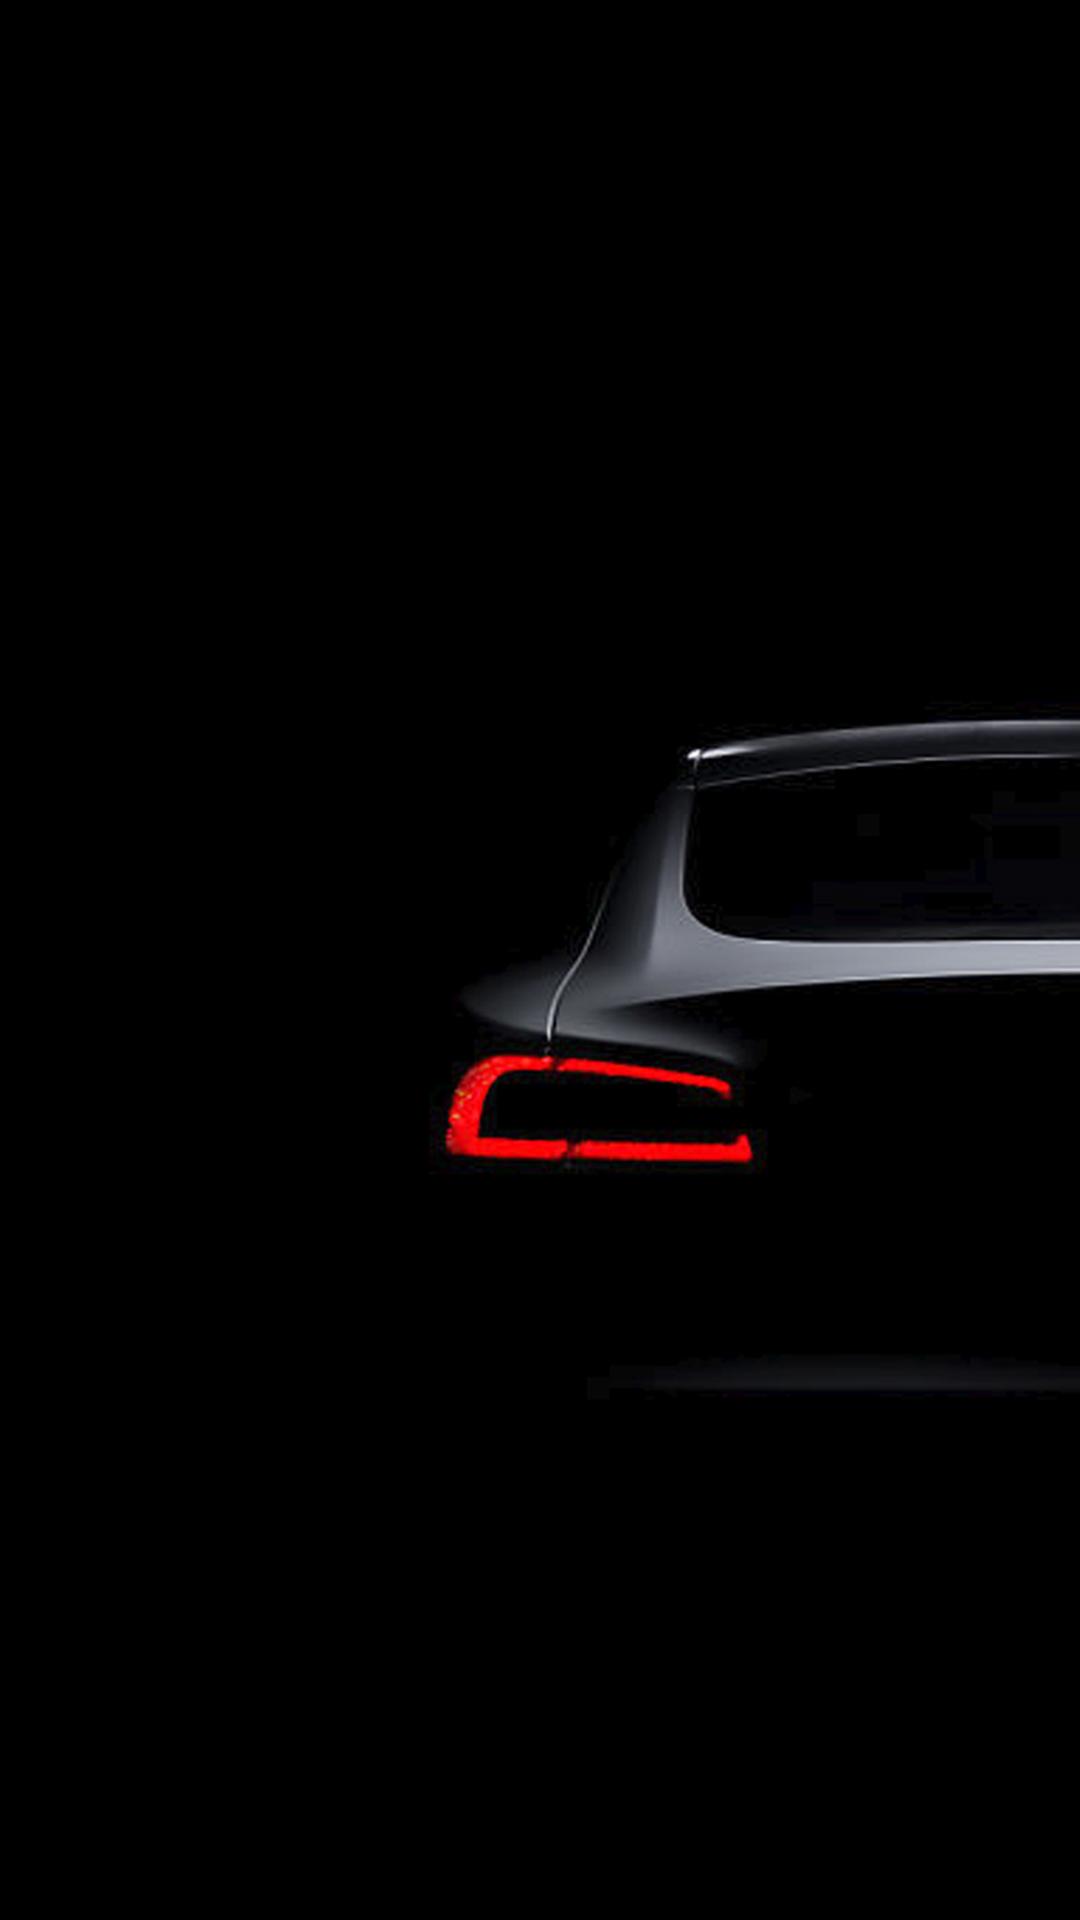 Black Wallpapers Tesla Model S Dark Brake Light iPhone 6 ...